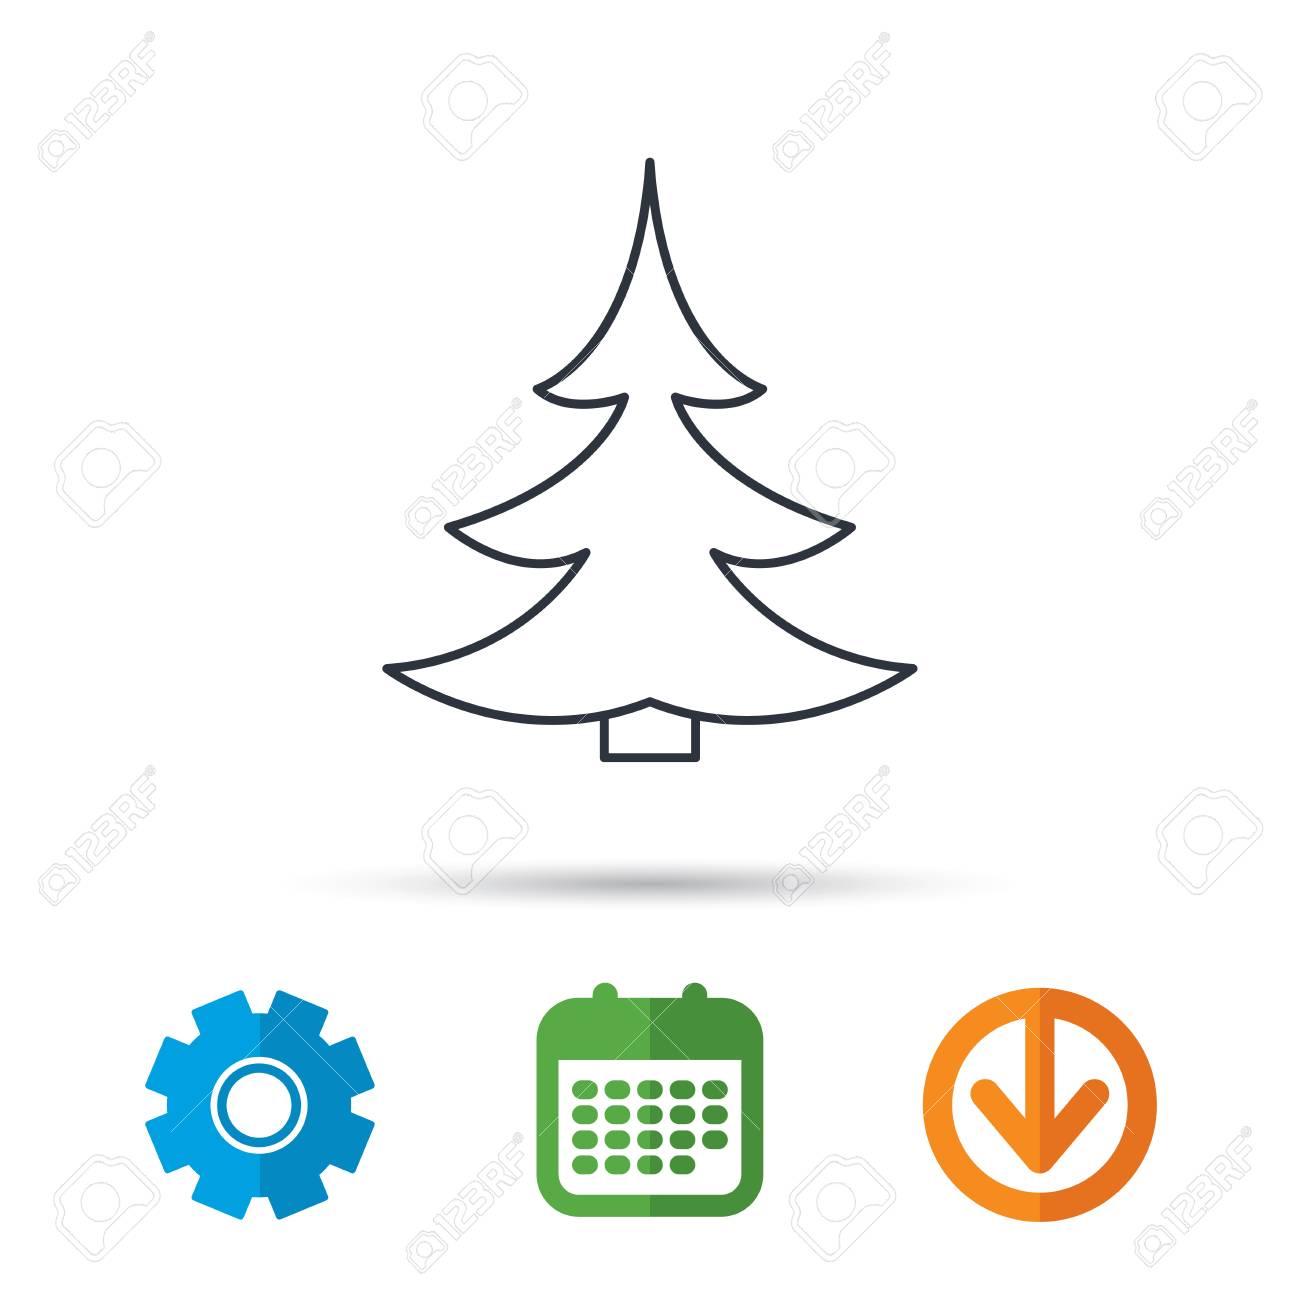 Christmas Arrow Signs.Christmas Fir Tree Icon Spruce Sign Winter Forest Symbol Calendar